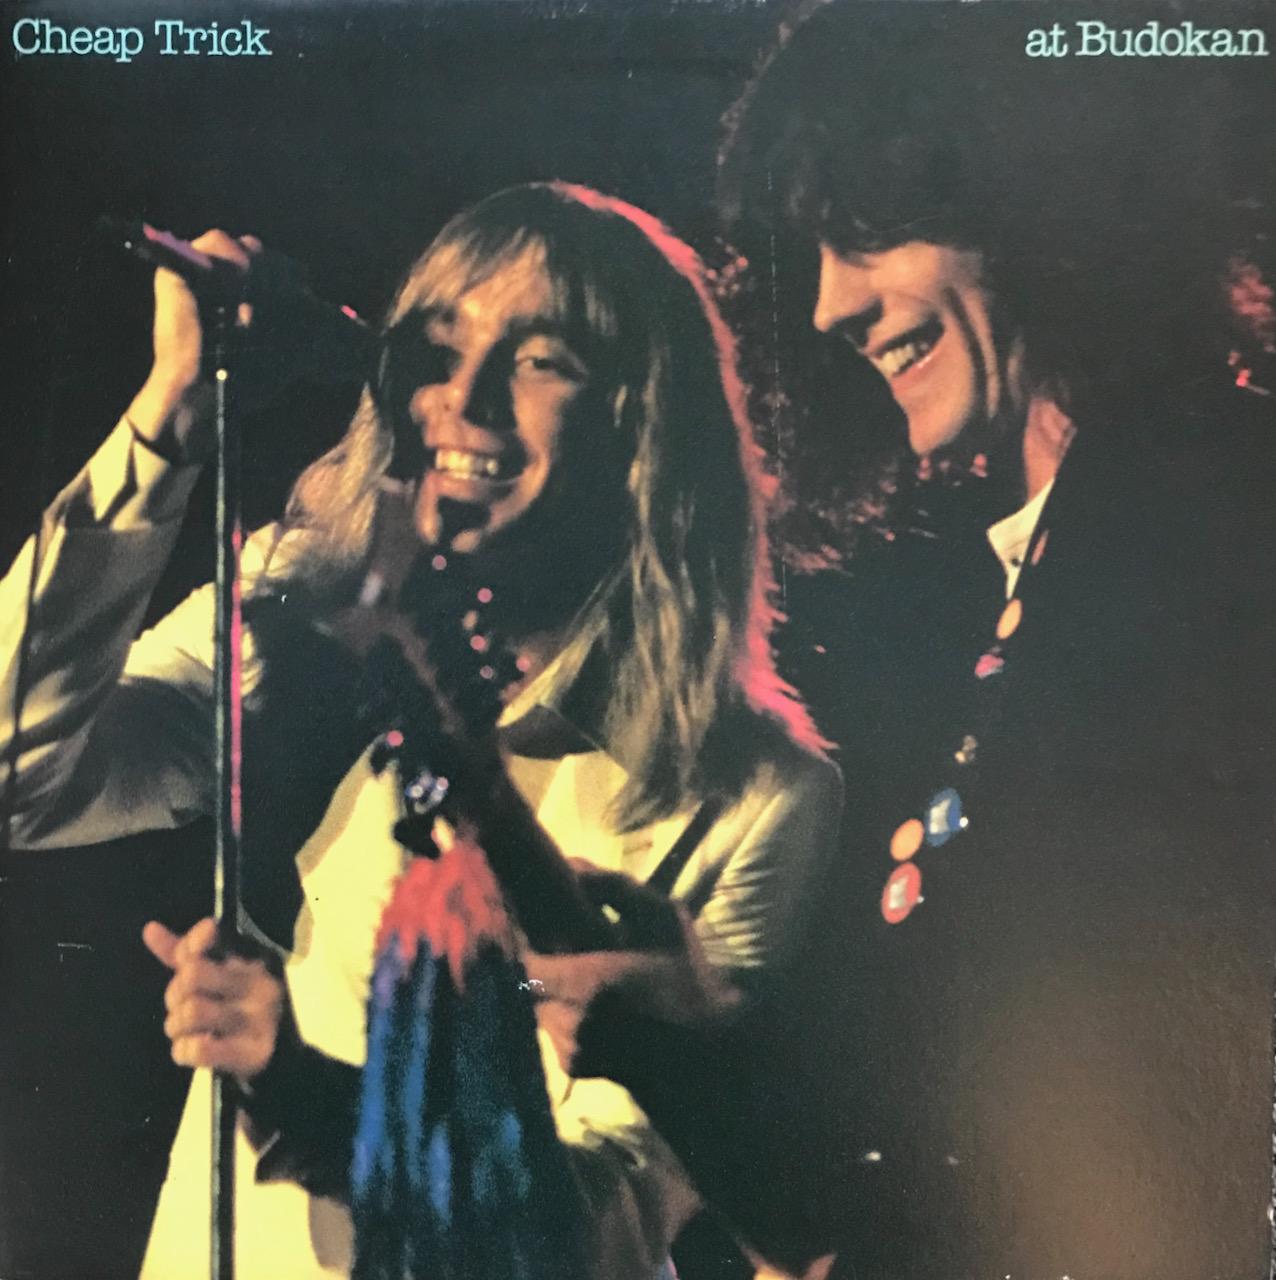 Cheap Trick – 'Cheap Trick at Budokan' (1978) – Album Review (The Cheap Trick Collection Series) ...